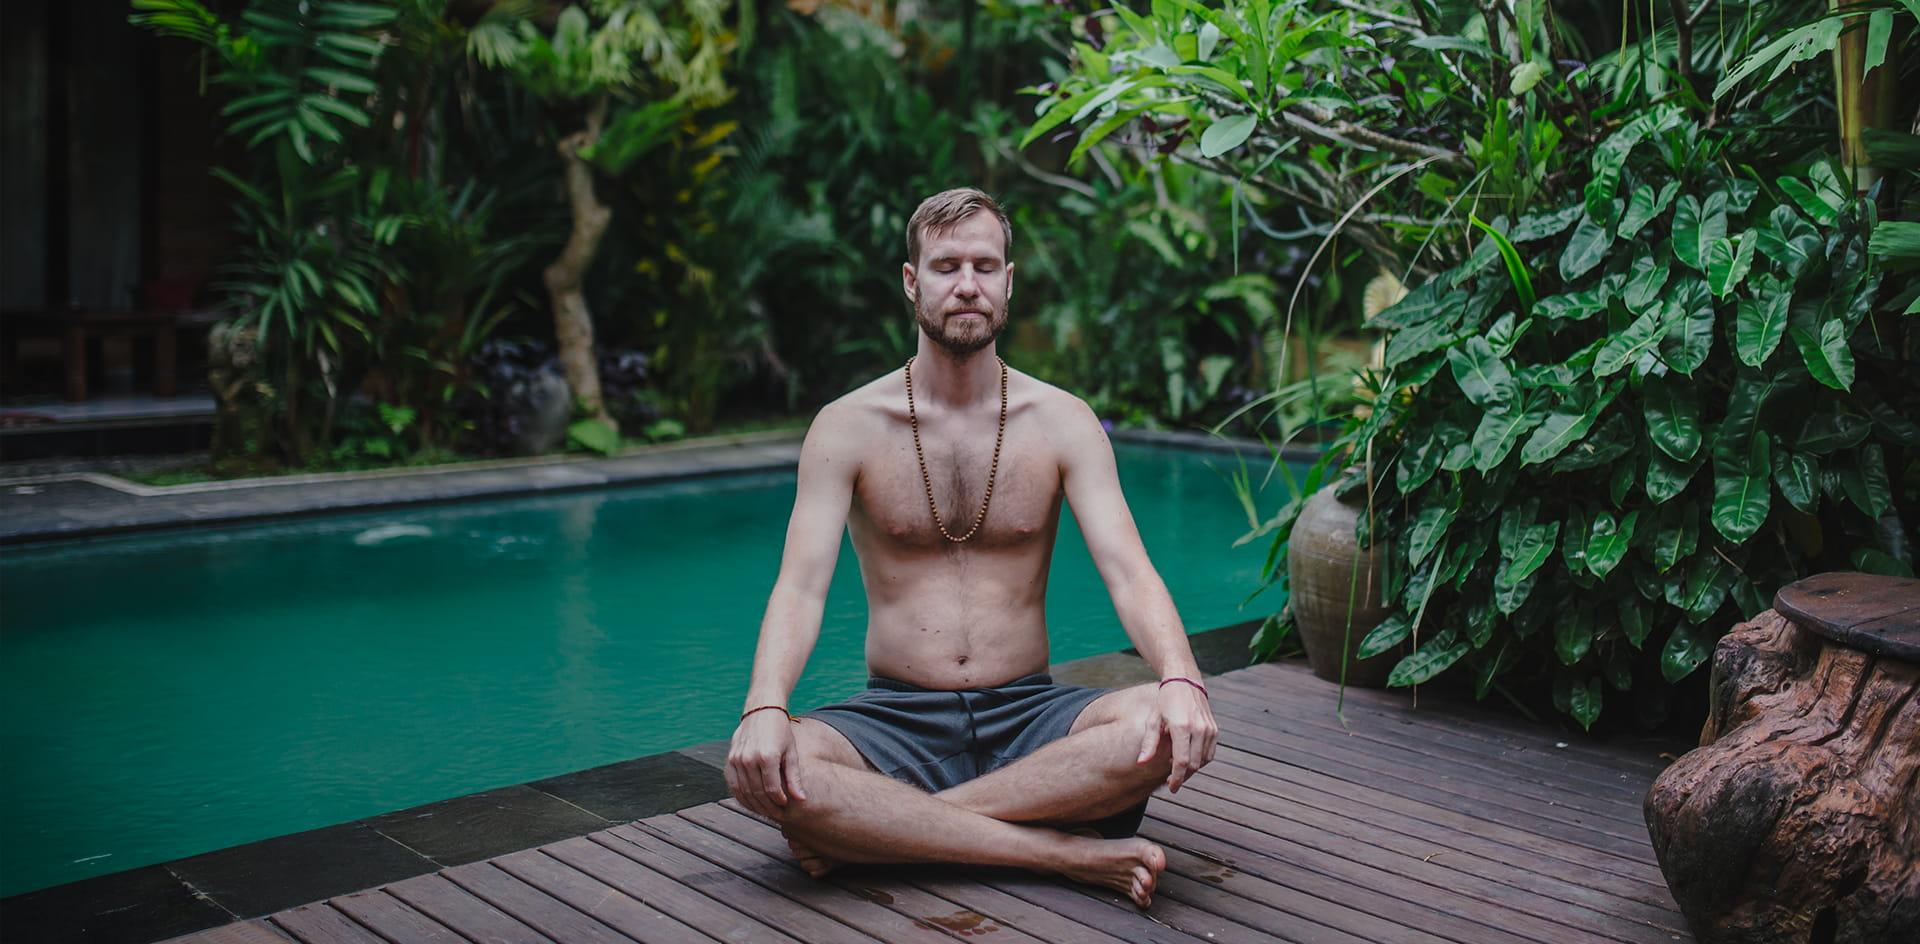 Jarosla Carda relaxing masages